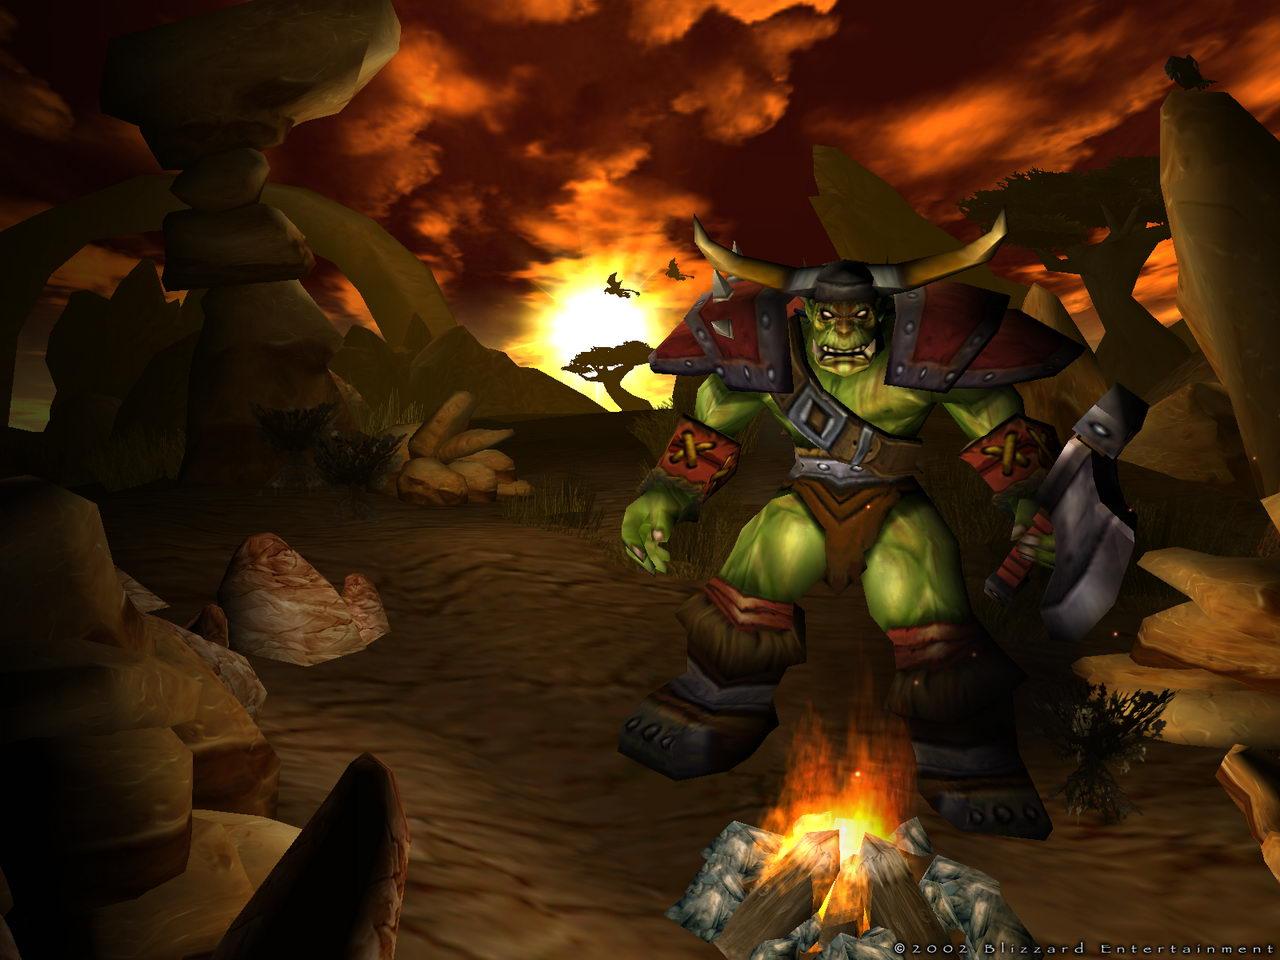 Orc buildings Warcraft 3 adult scenes